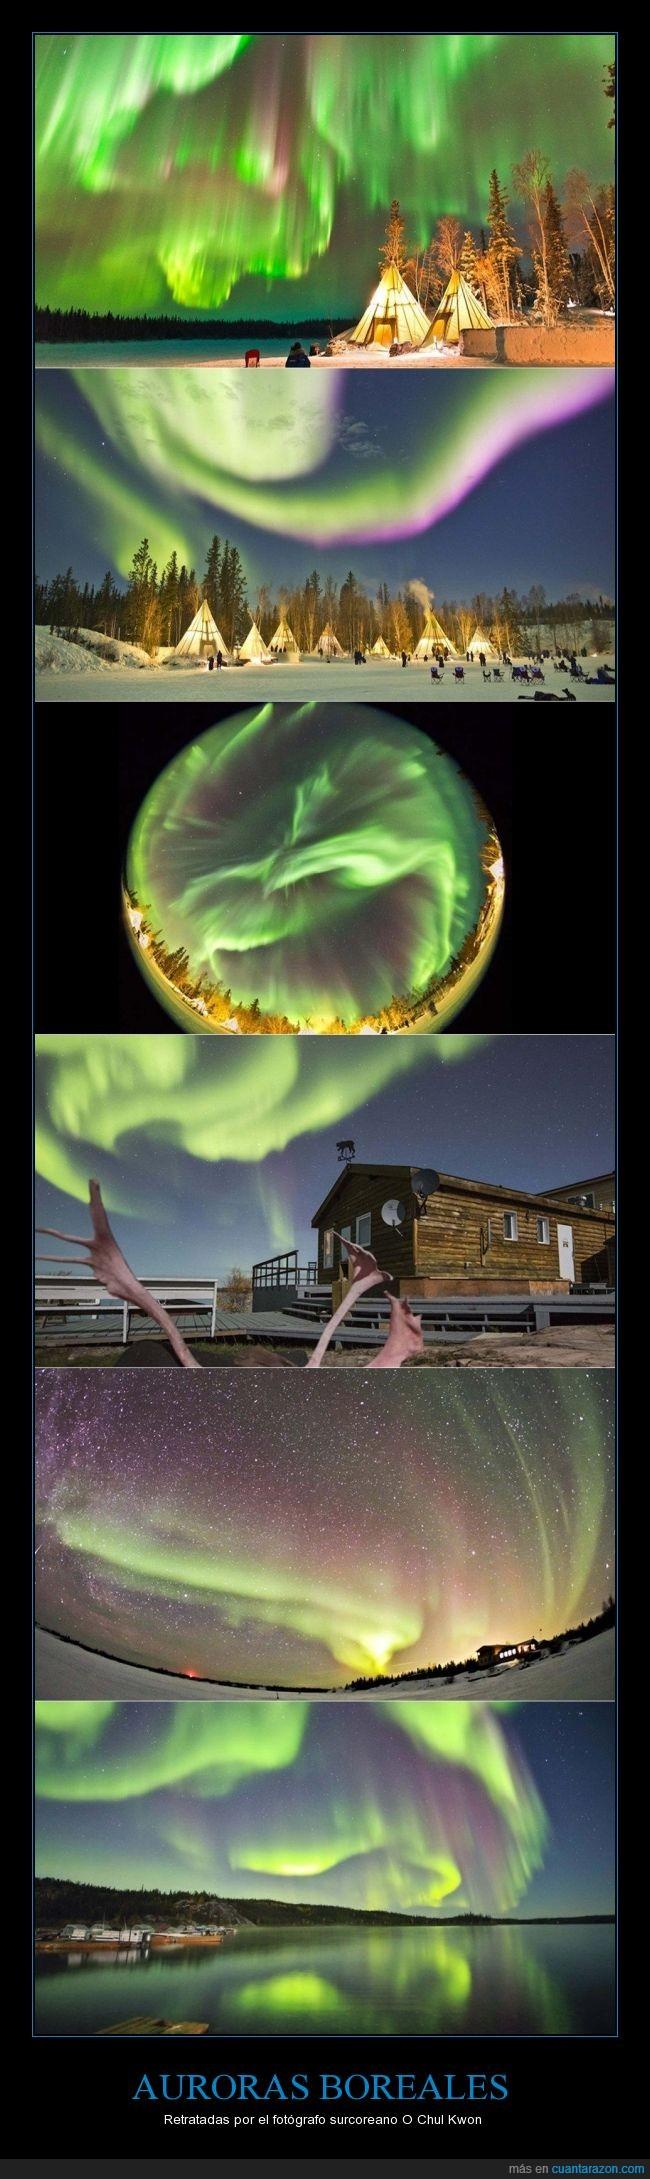 Aldea de la Aurora,auroras boreales,Canadá,Corea del Sur,espectáculo,fotógrafo,hermoso,impresionante,O Chul Kwon,Seúl,Yellowknife